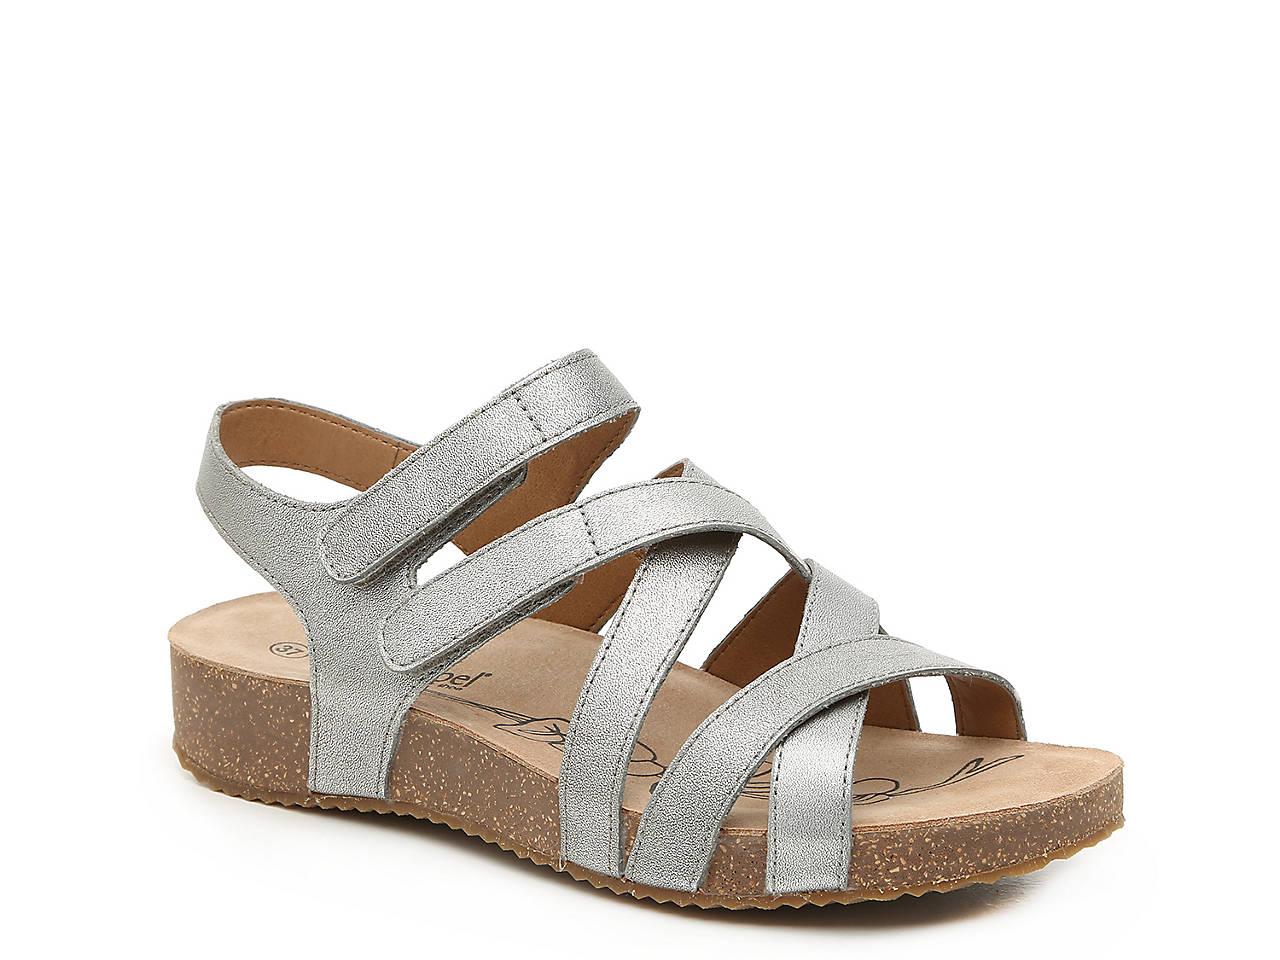 f3d2bfda1efa Josef Seibel Tonga 37 Wedge Sandal Women s Shoes